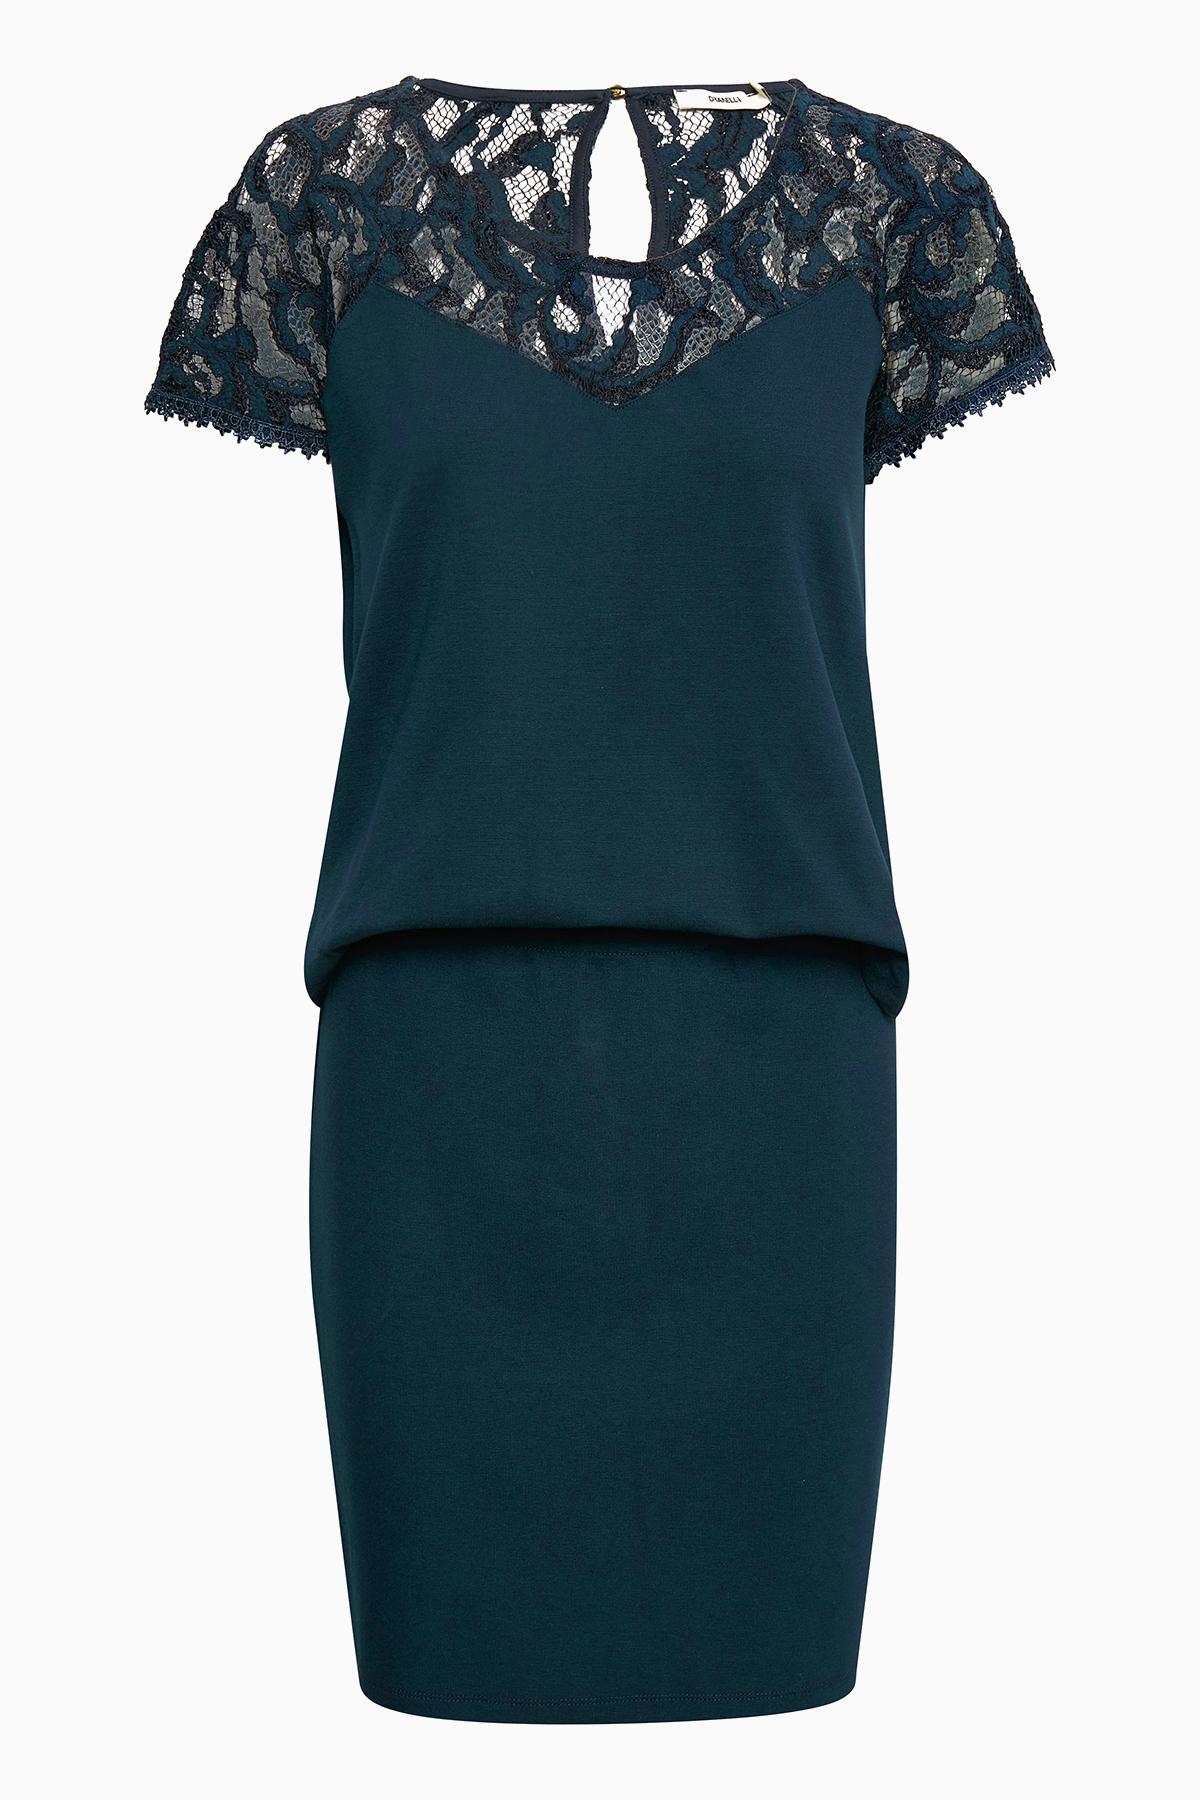 Dranella Dame Fin kjole - Mørkeblå